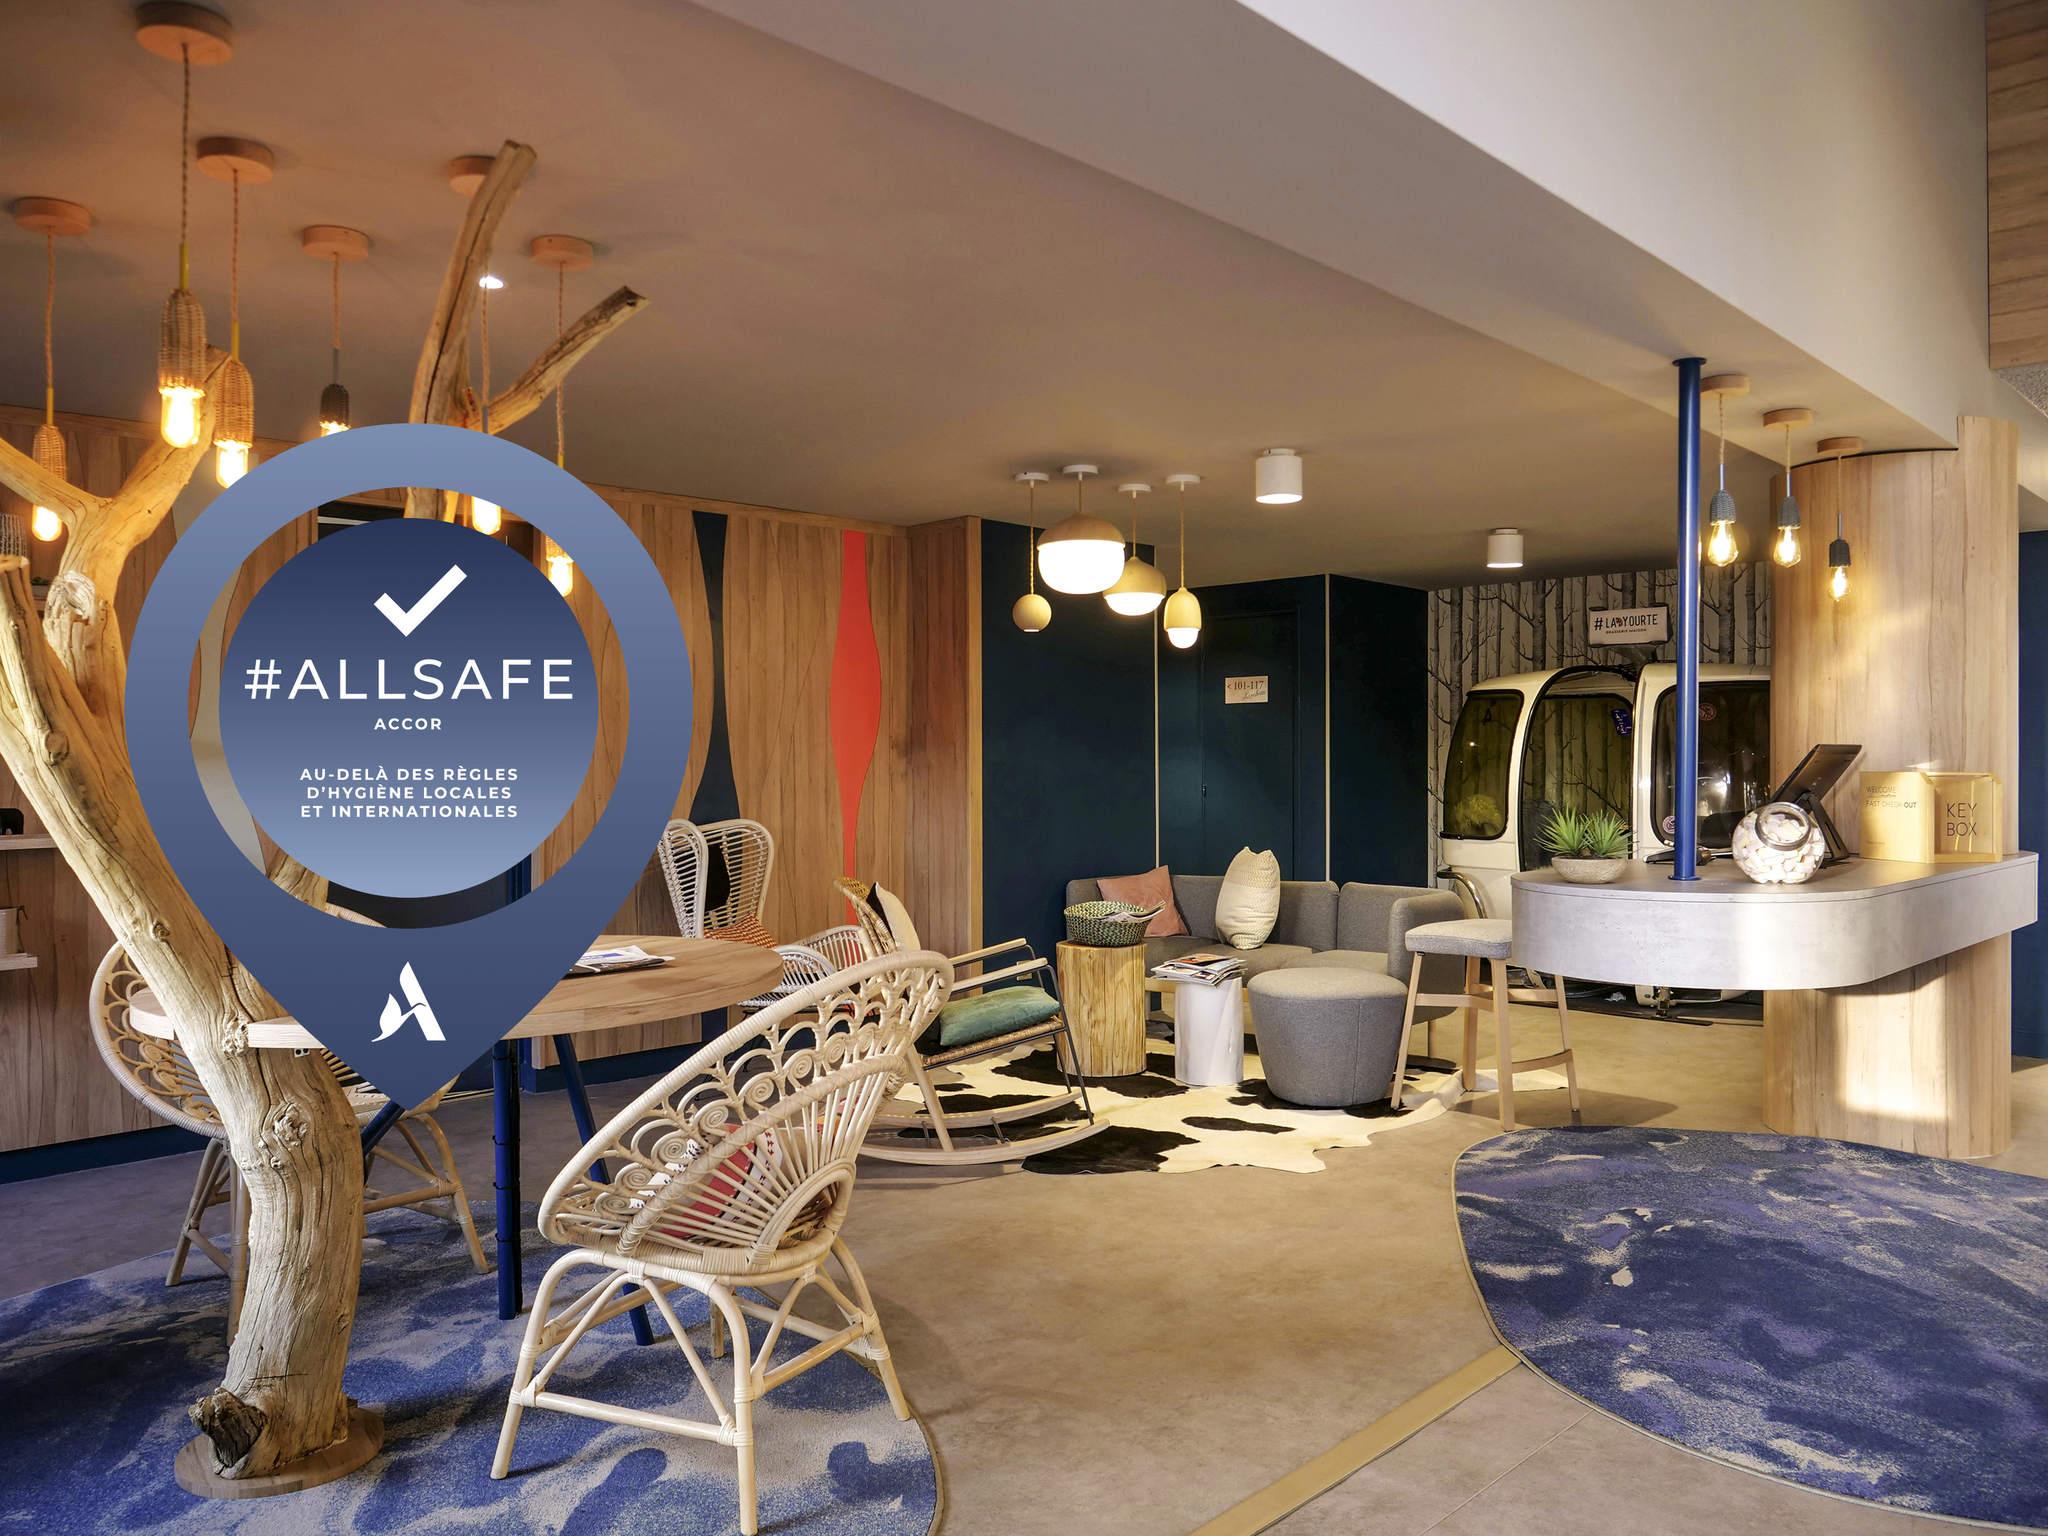 simple hotel mercure annemasse porte de genve hotel with millet porte d entre. Black Bedroom Furniture Sets. Home Design Ideas